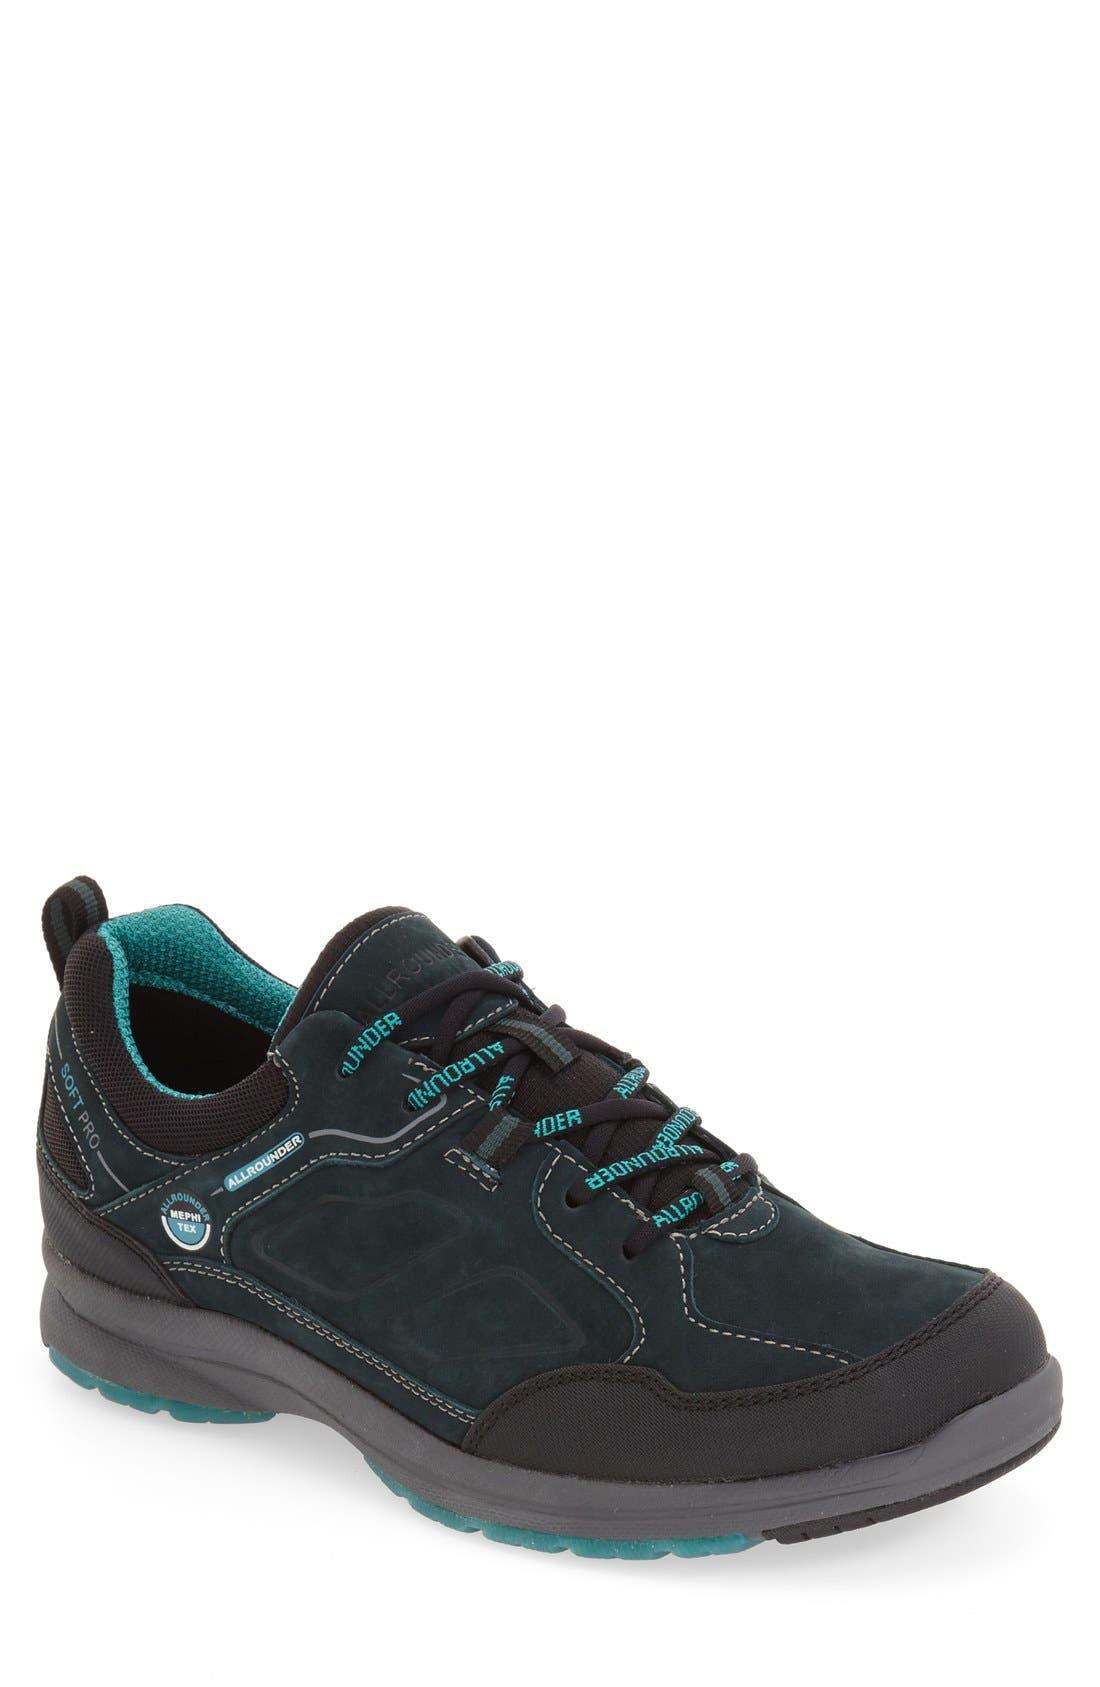 'Dascha Tex' Waterproof Sneaker,                             Main thumbnail 1, color,                             Black/ Olive Nubuck Leather